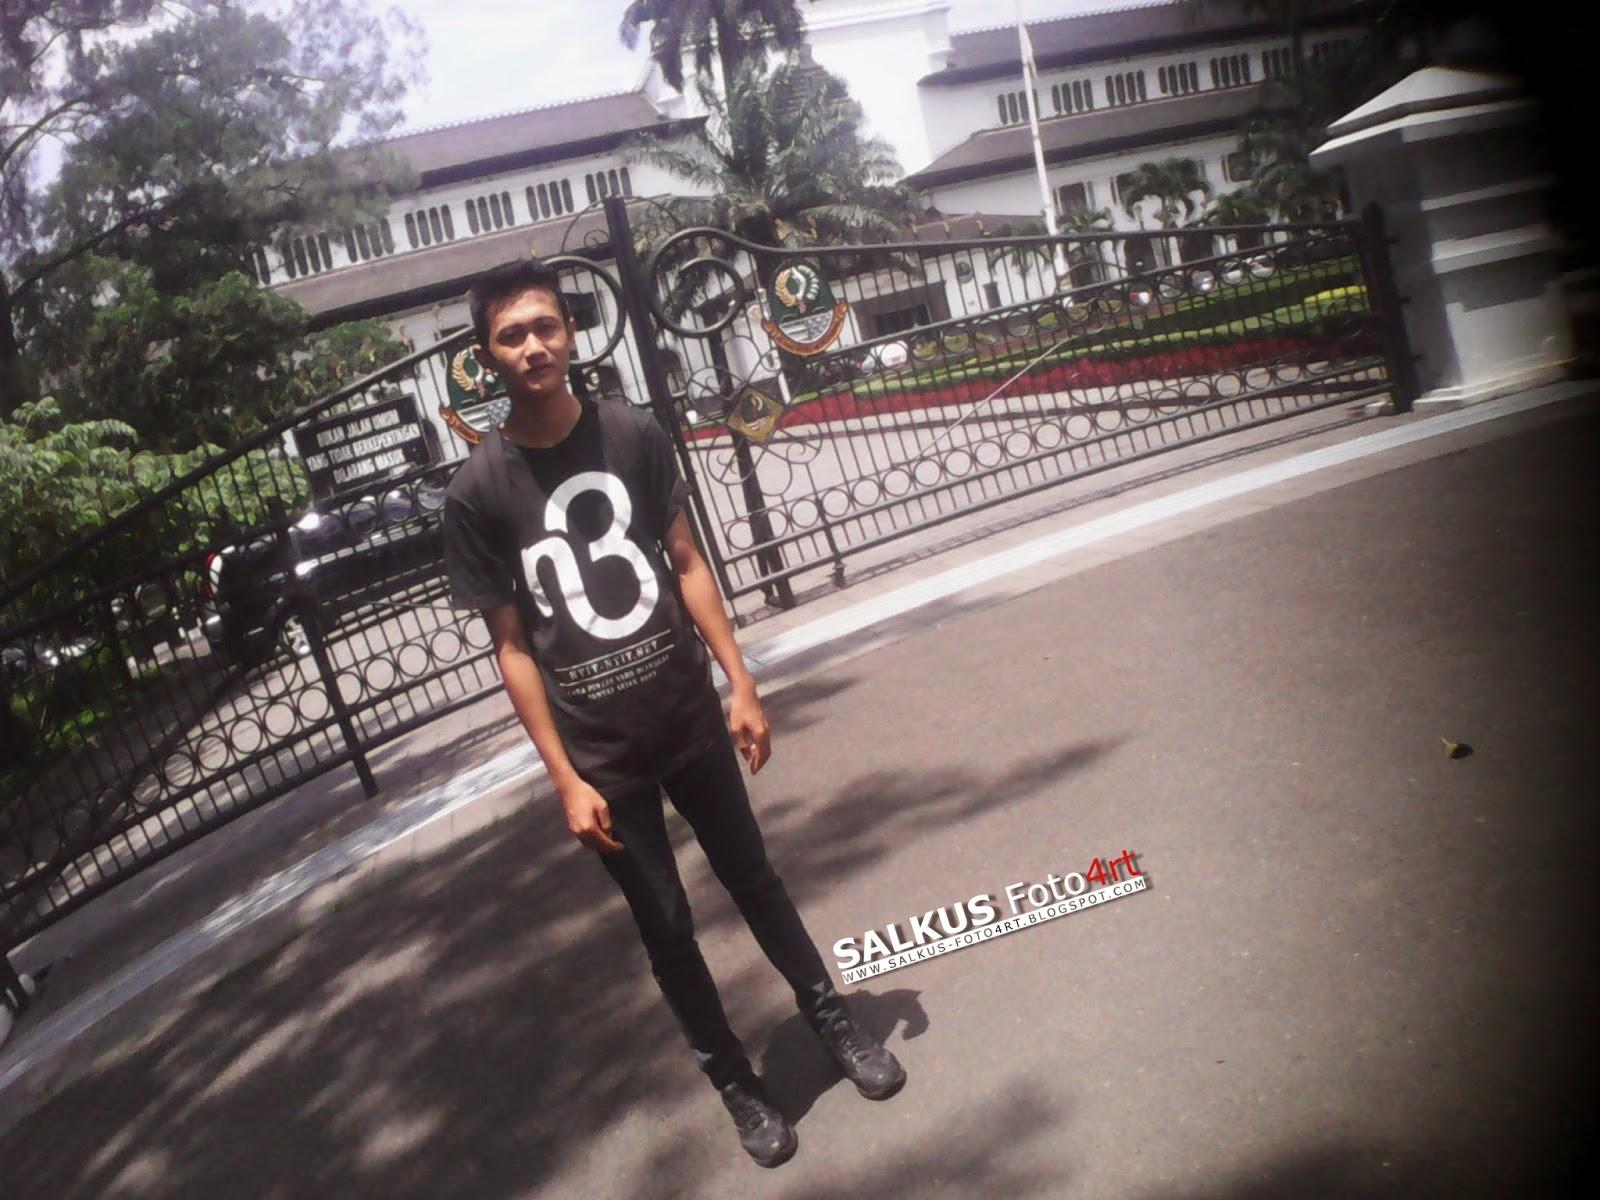 Wisata Bandung | SalkusFoto4rt | Album AzisJS